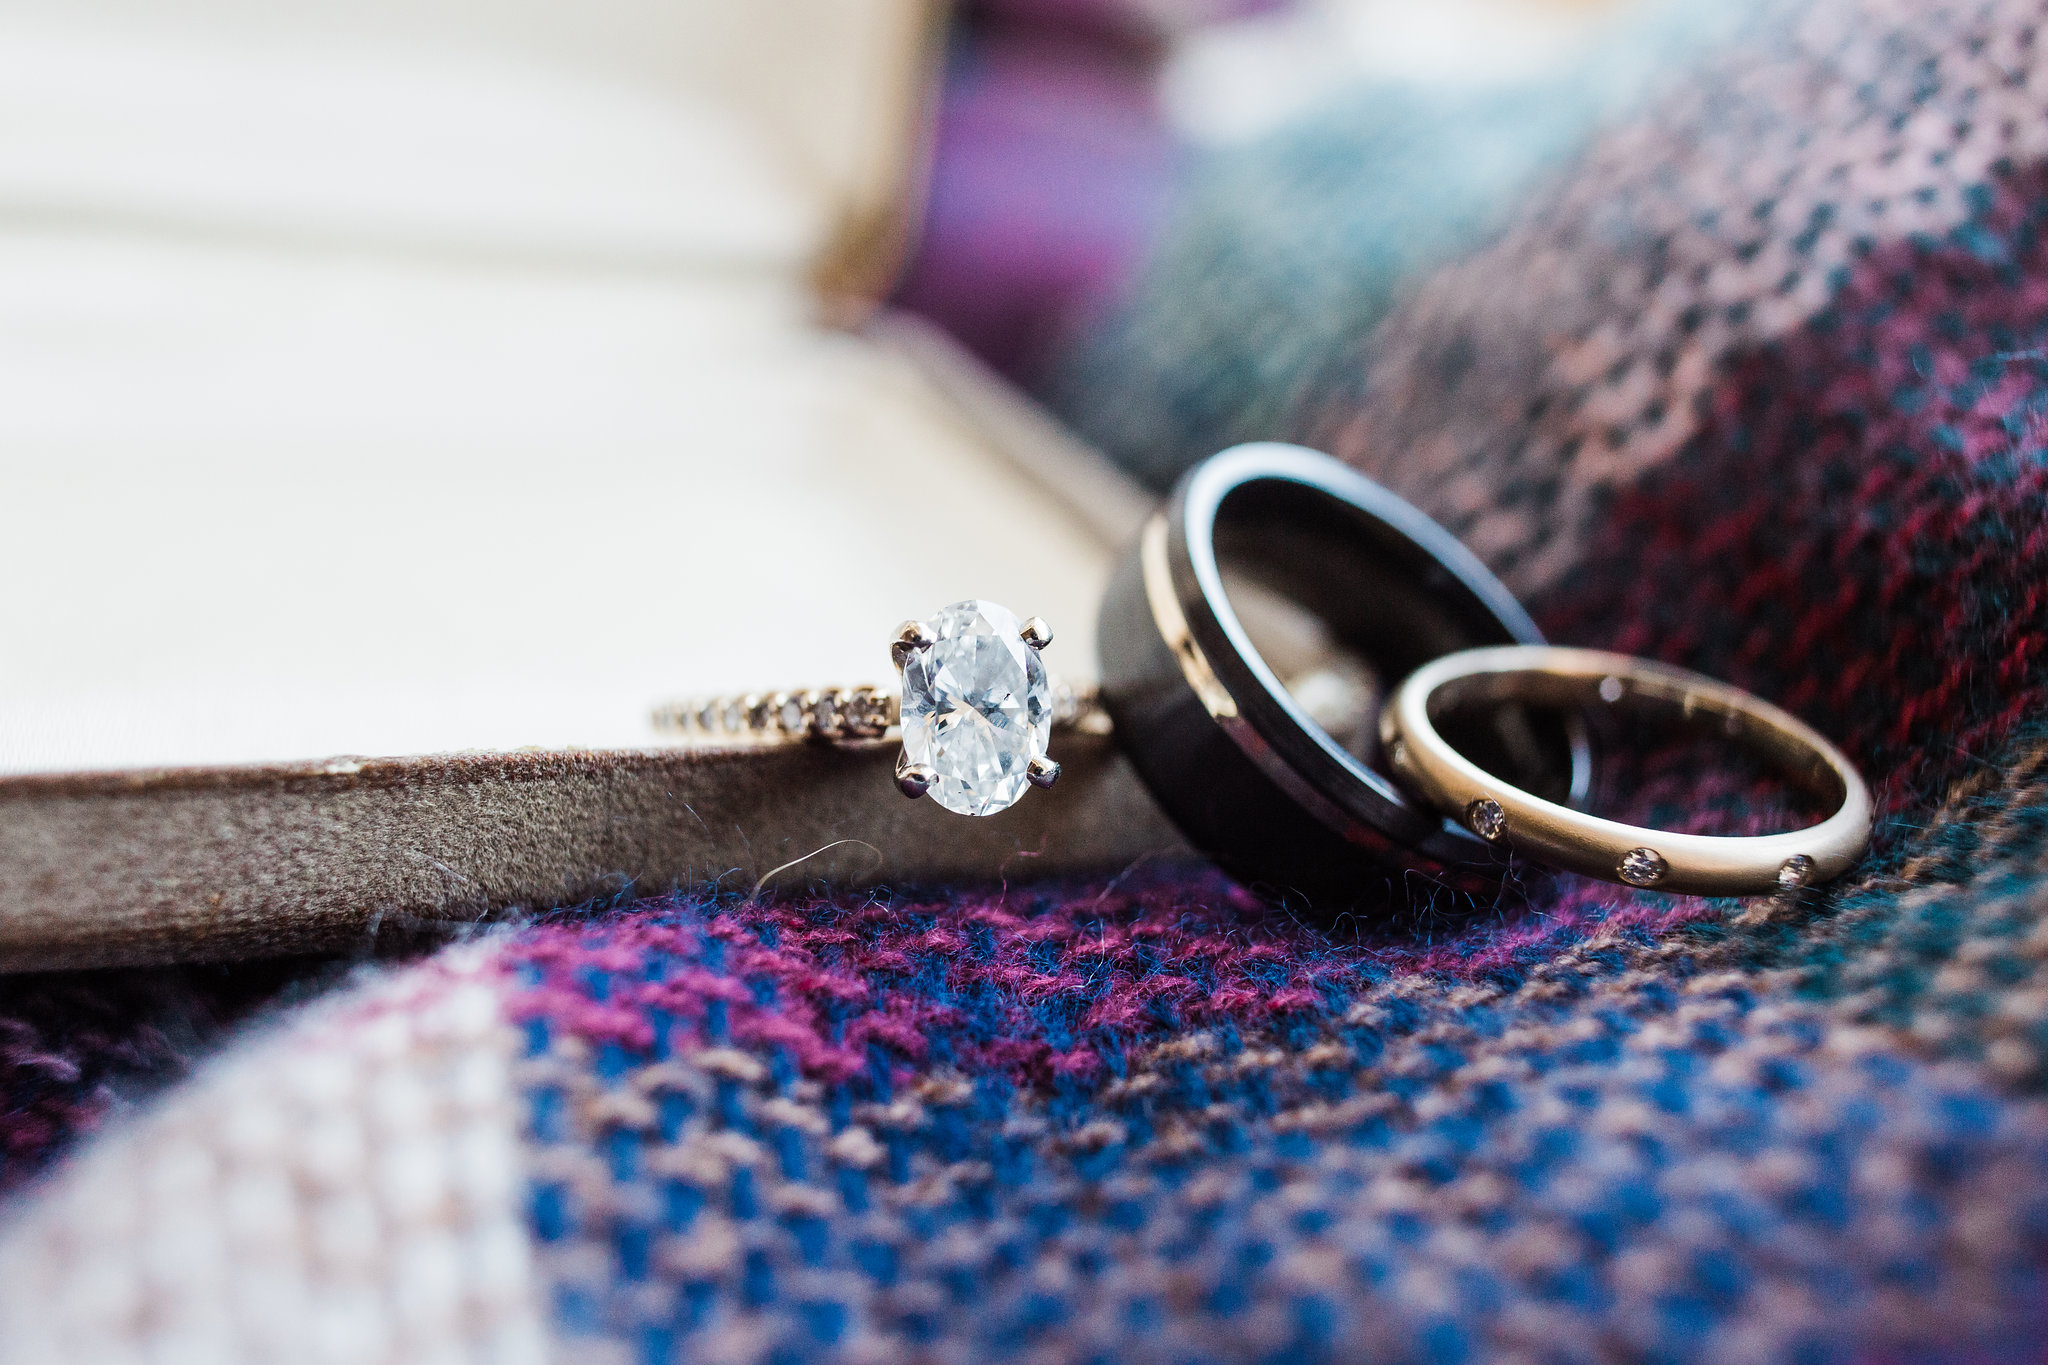 apt-b-photography-kristy-rob-wormsloe-elopment-savannah-wedding-photographer-savannah-elopement-wormsloe-wedding-historic-savannah-engagement-ring-2.jpg